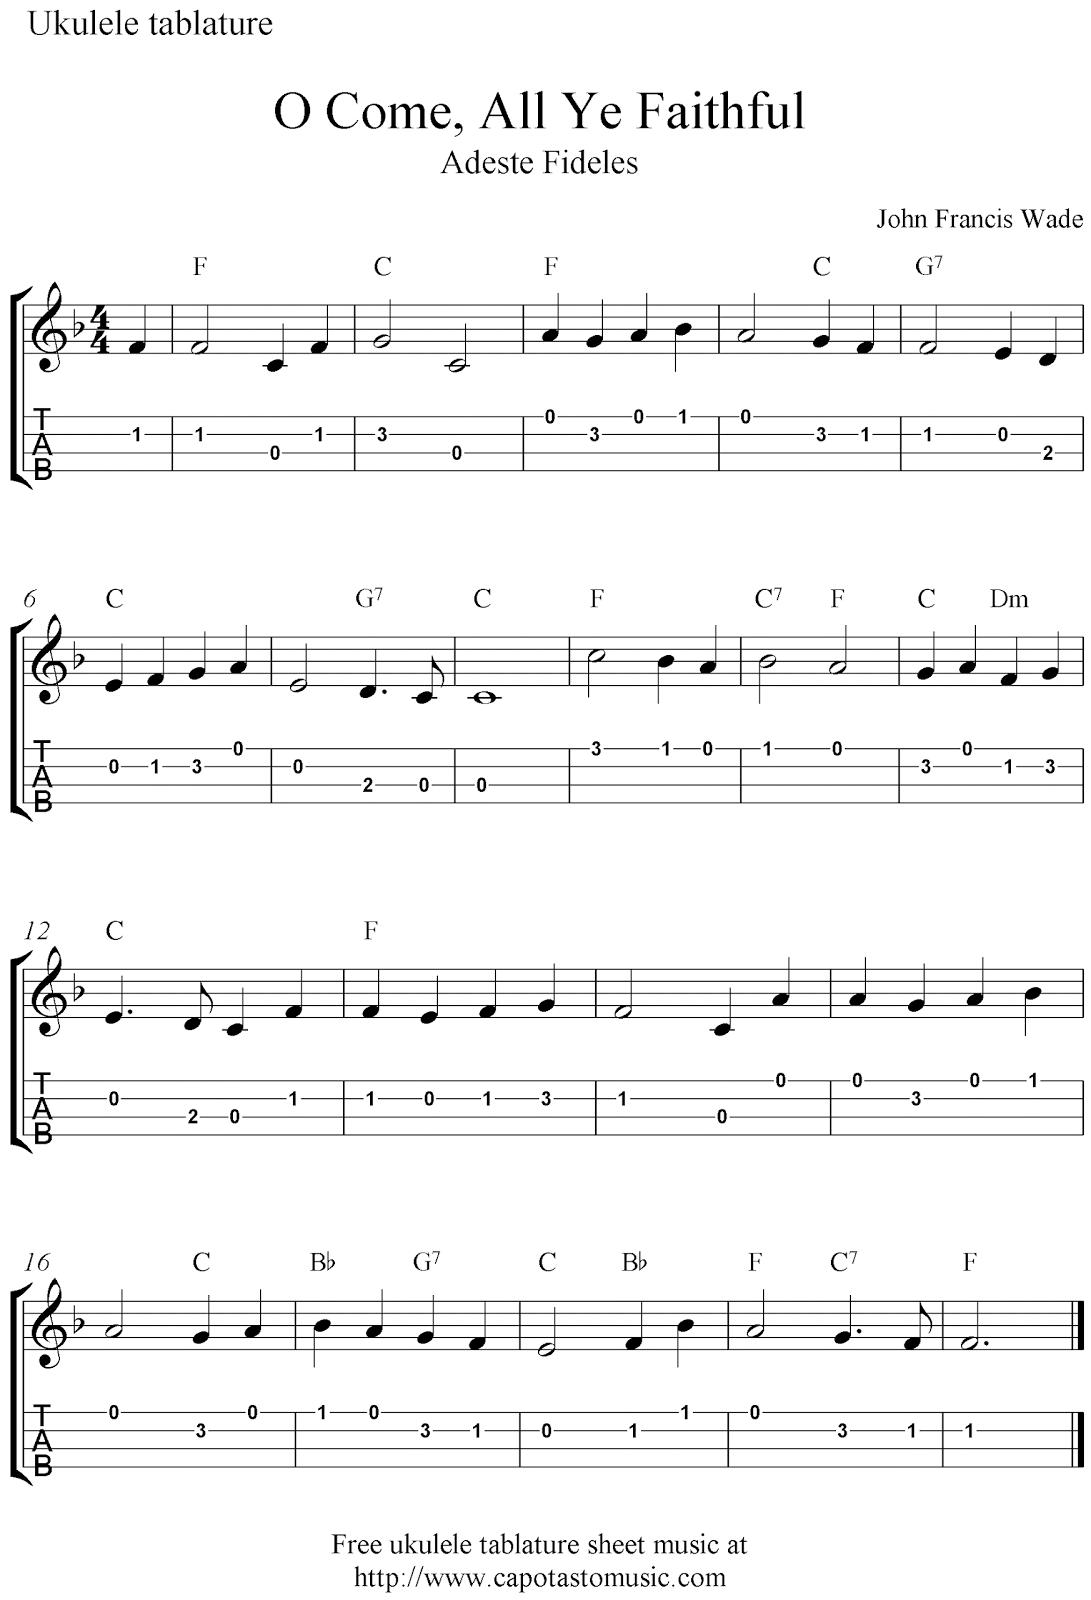 Pin by dave loreto on uke christmas pinterest ukulele tabs guitar chords hexwebz Image collections